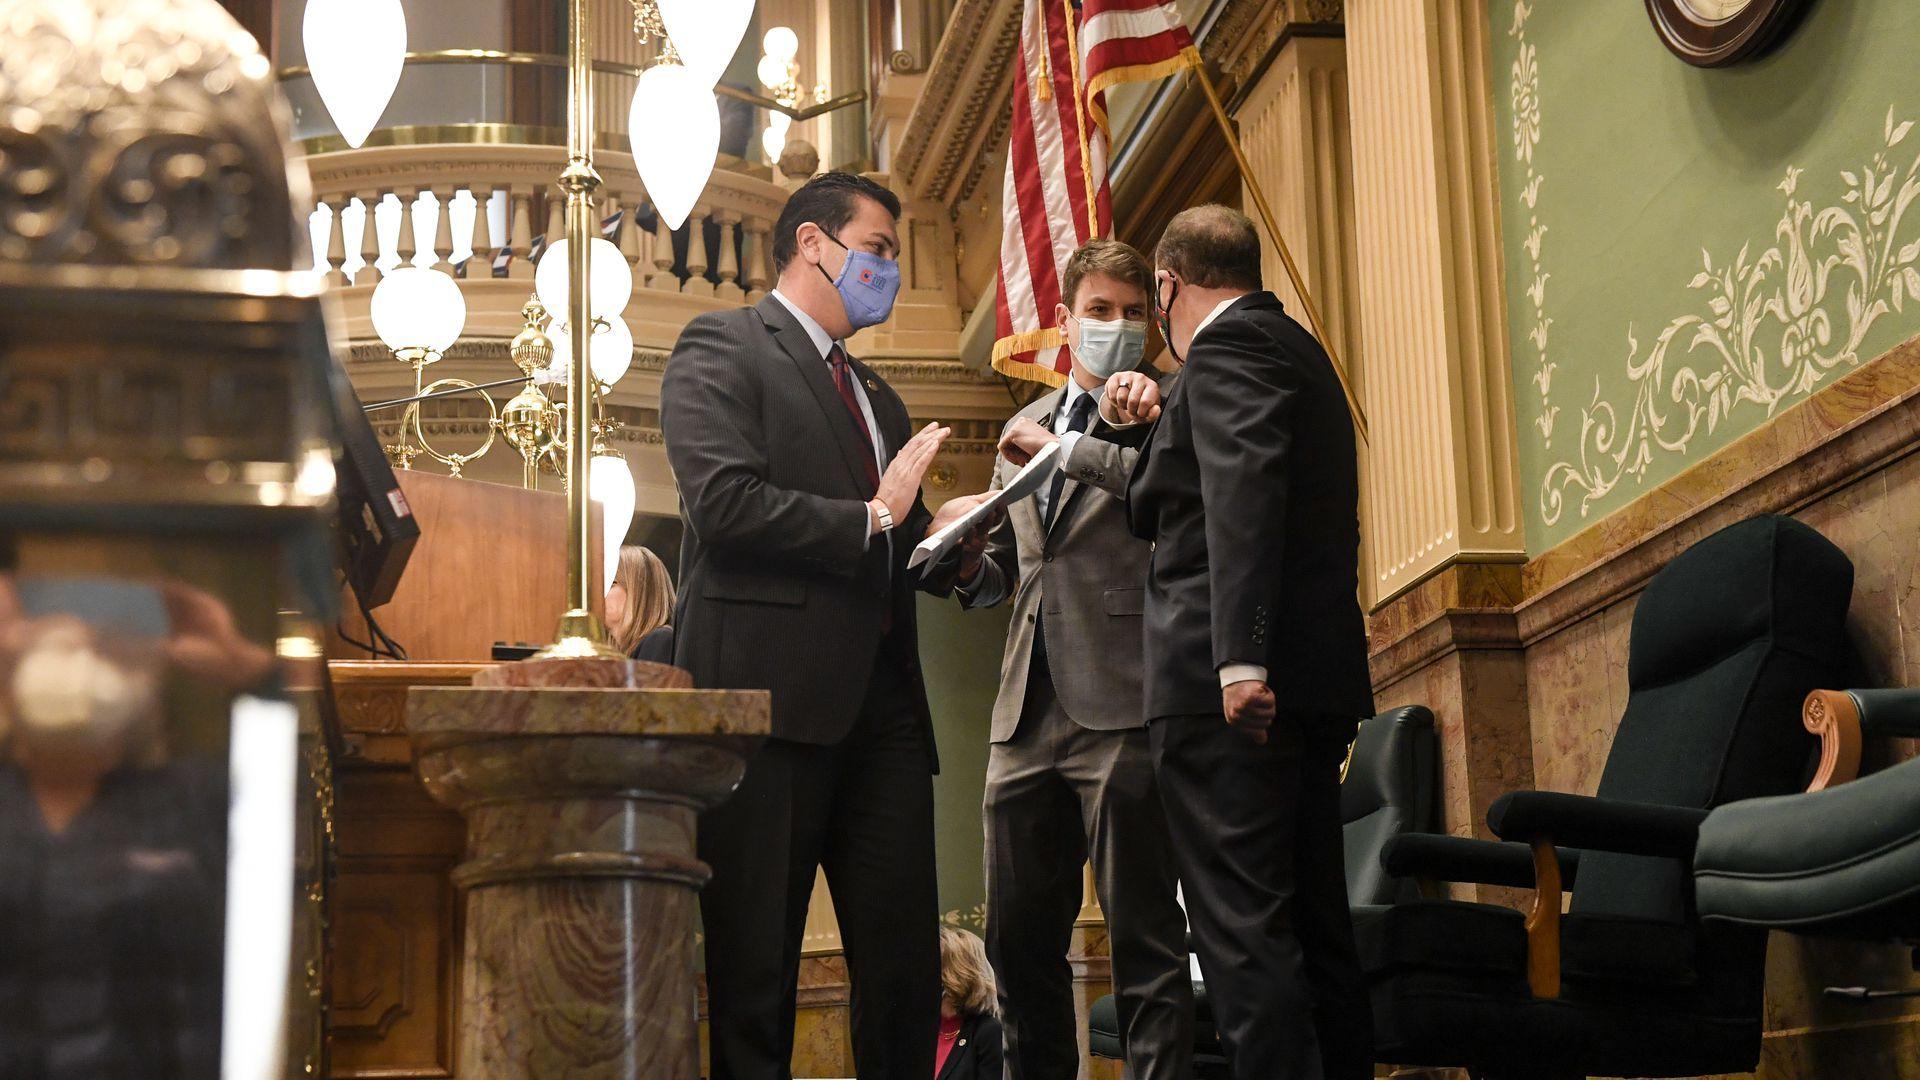 Colorado Gov. Jared Polis elbow bumps State House Speaker Alec Garnett ahead of a joint address.